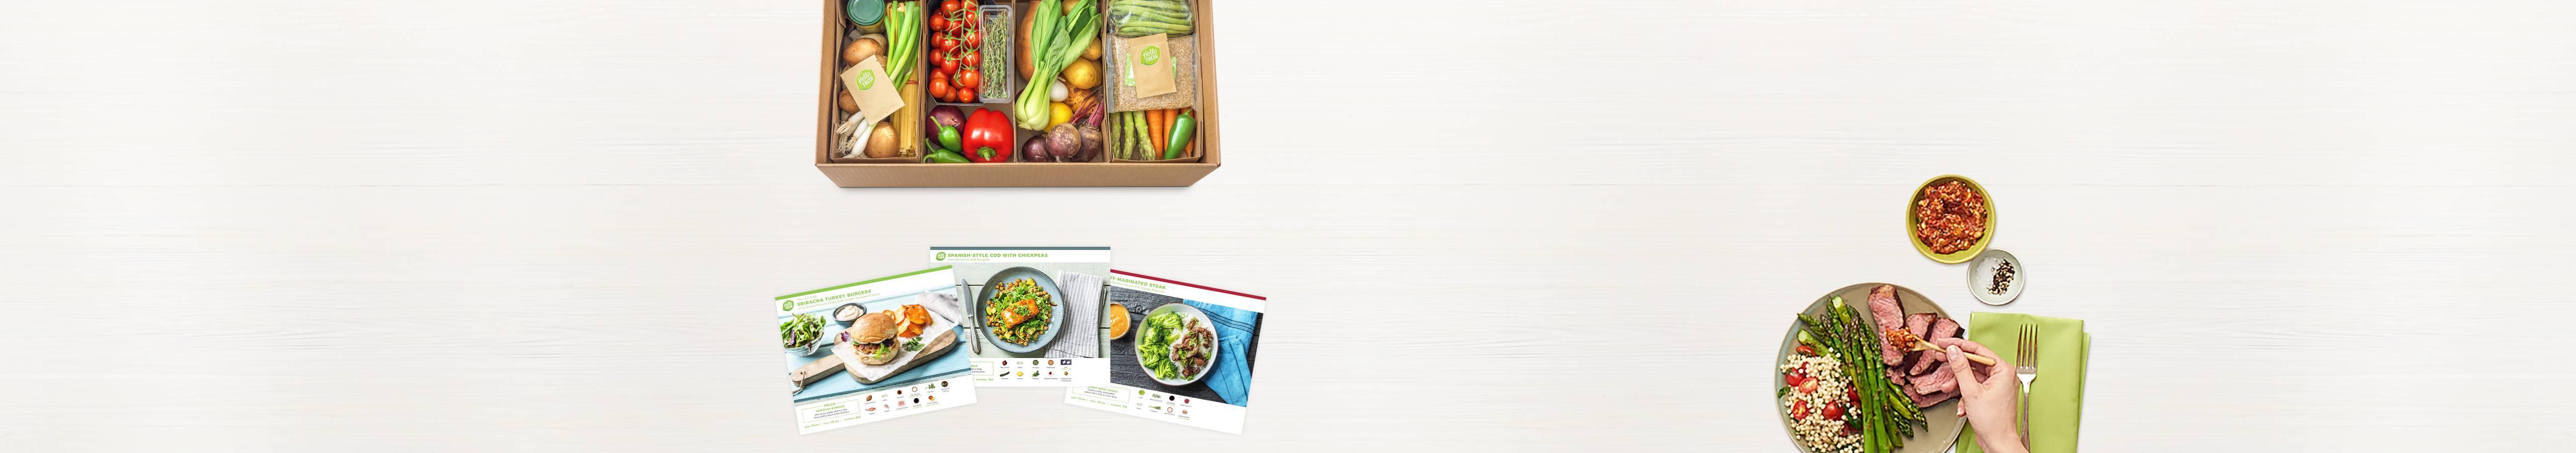 Hellofresh Get Cooking Meal Kit Delivery Order Food